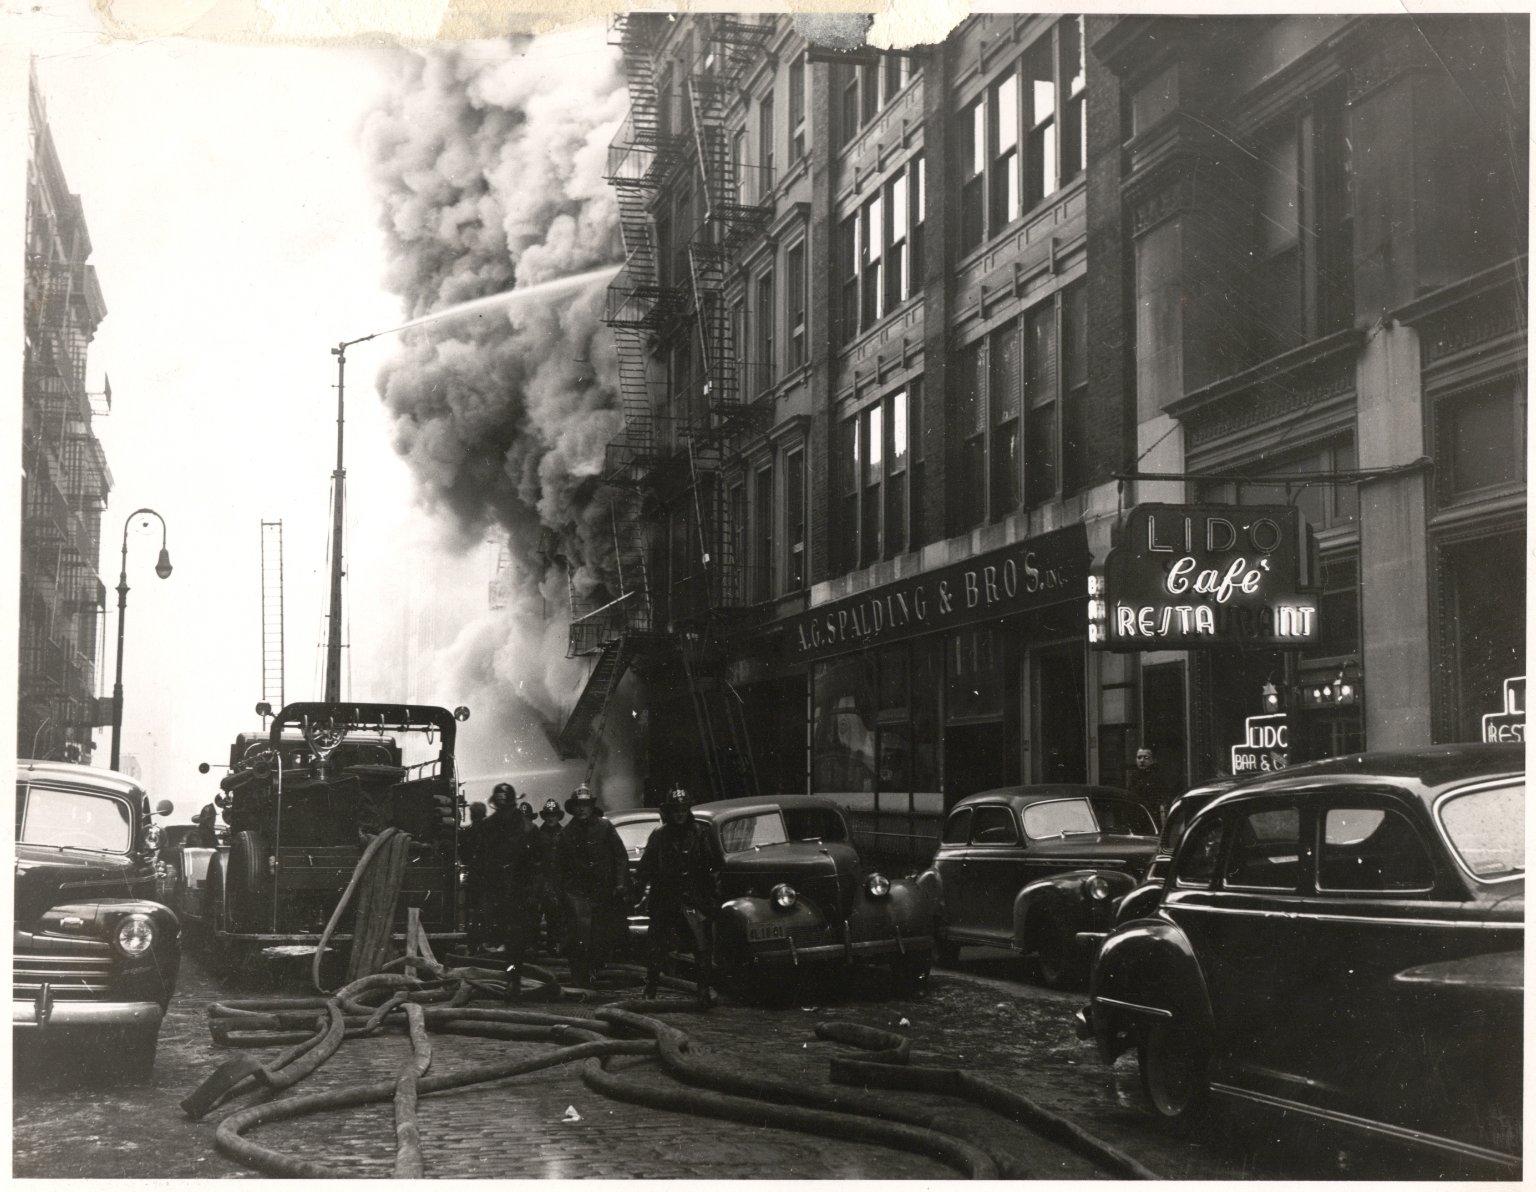 Пожар в центре Манхэттена, Нью-Йорк, США. 1950-е